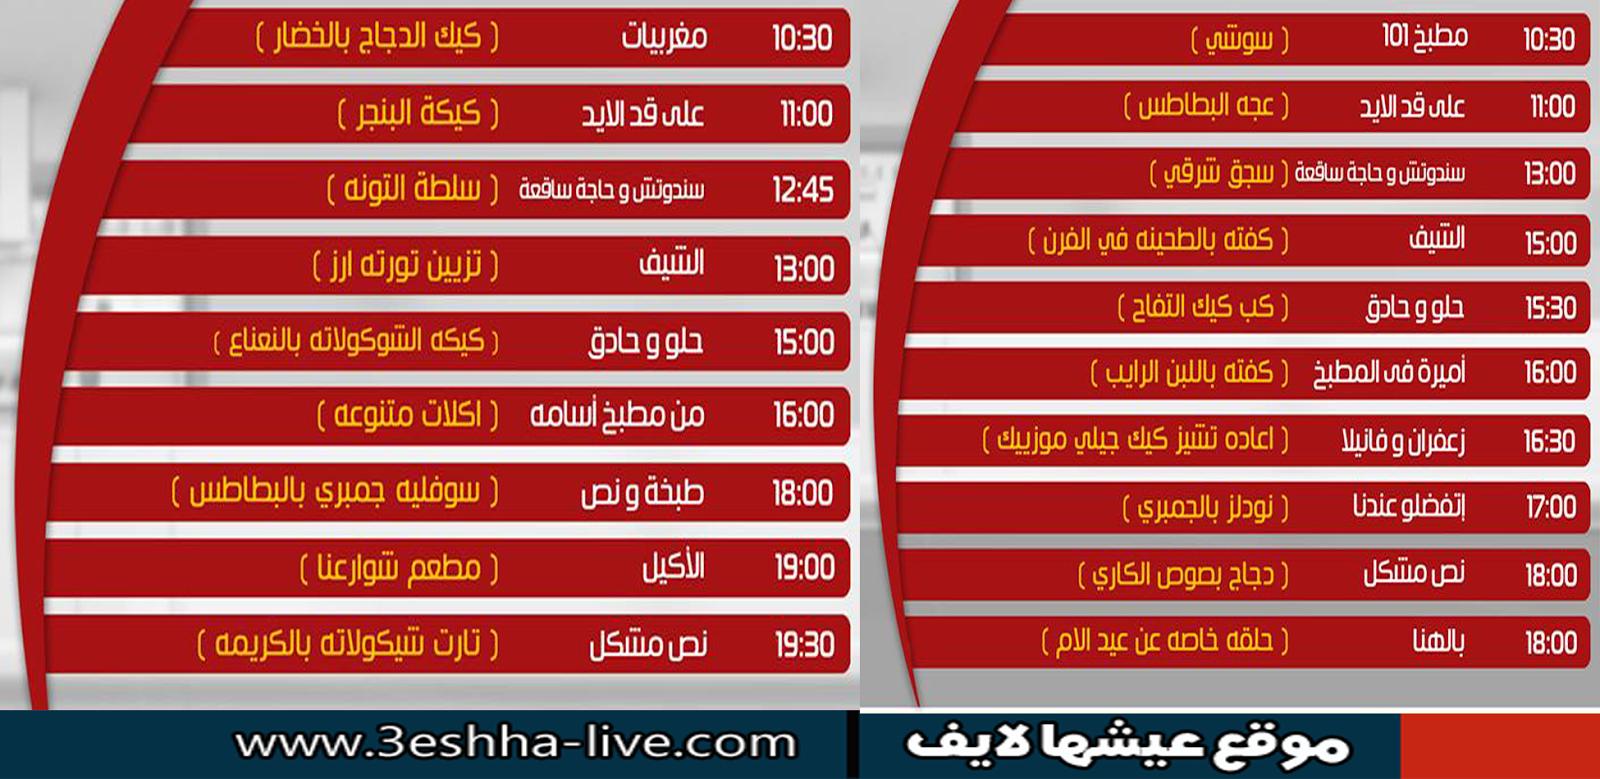 برامج قناة سي بي سي سفرة